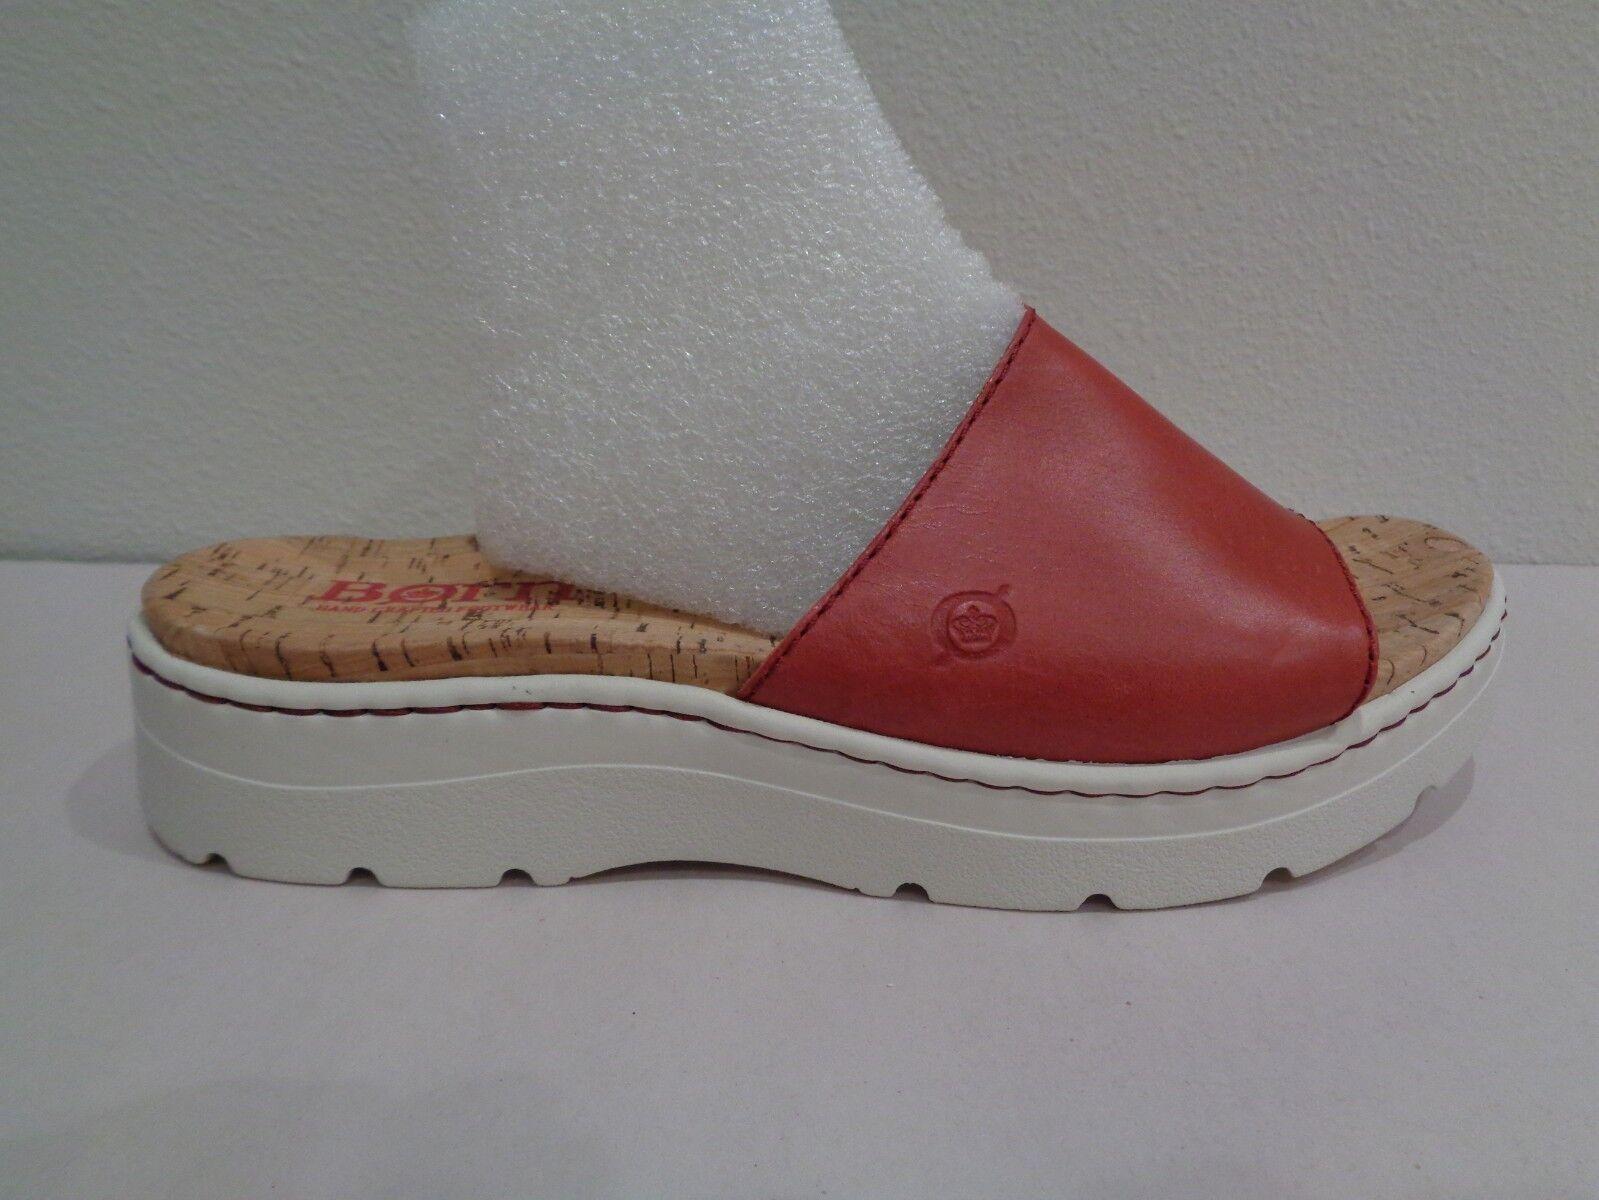 Nacido M Benítez Rojo Cuero Nuevos Mujer Zapatos Sandalias De Plataforma Diapositivas